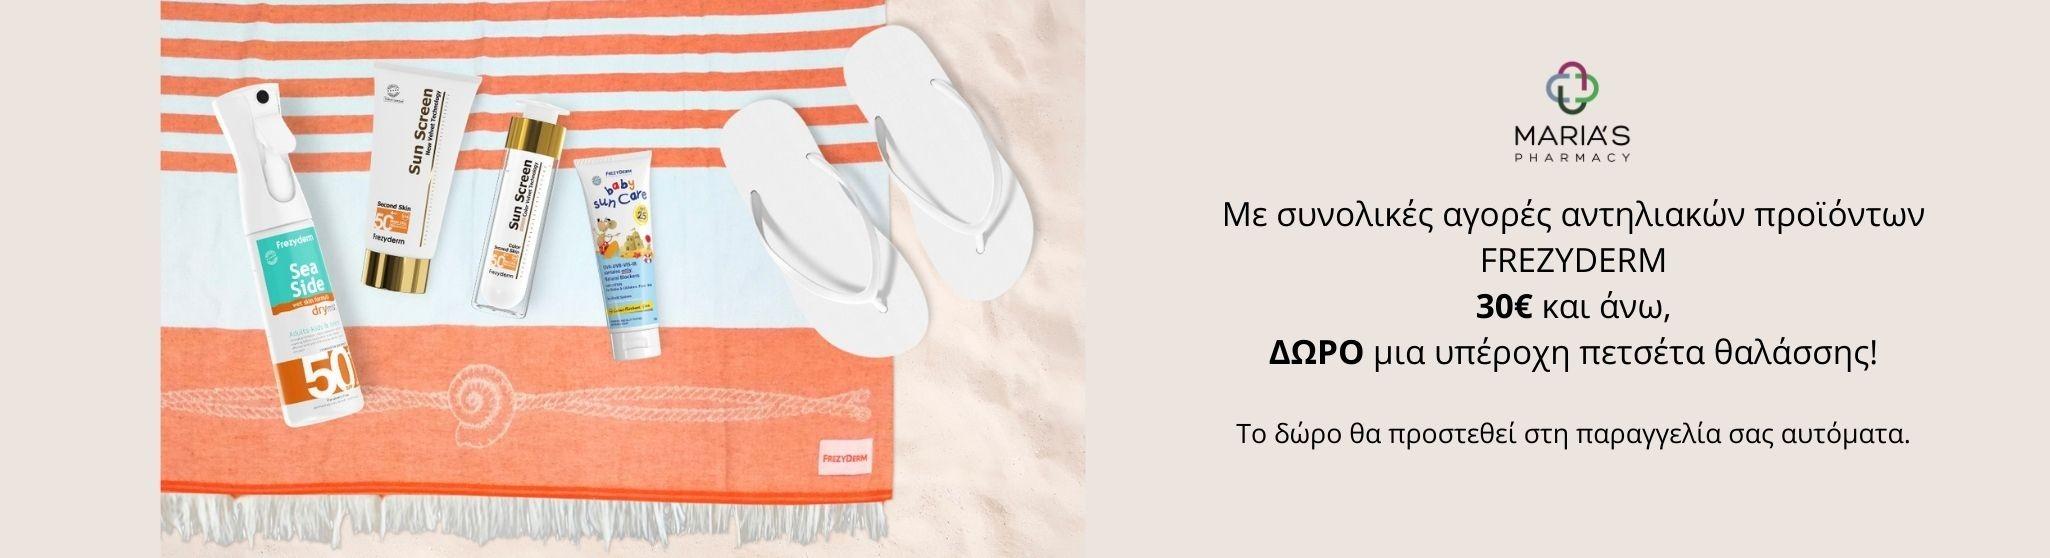 Frezyderm beach towel